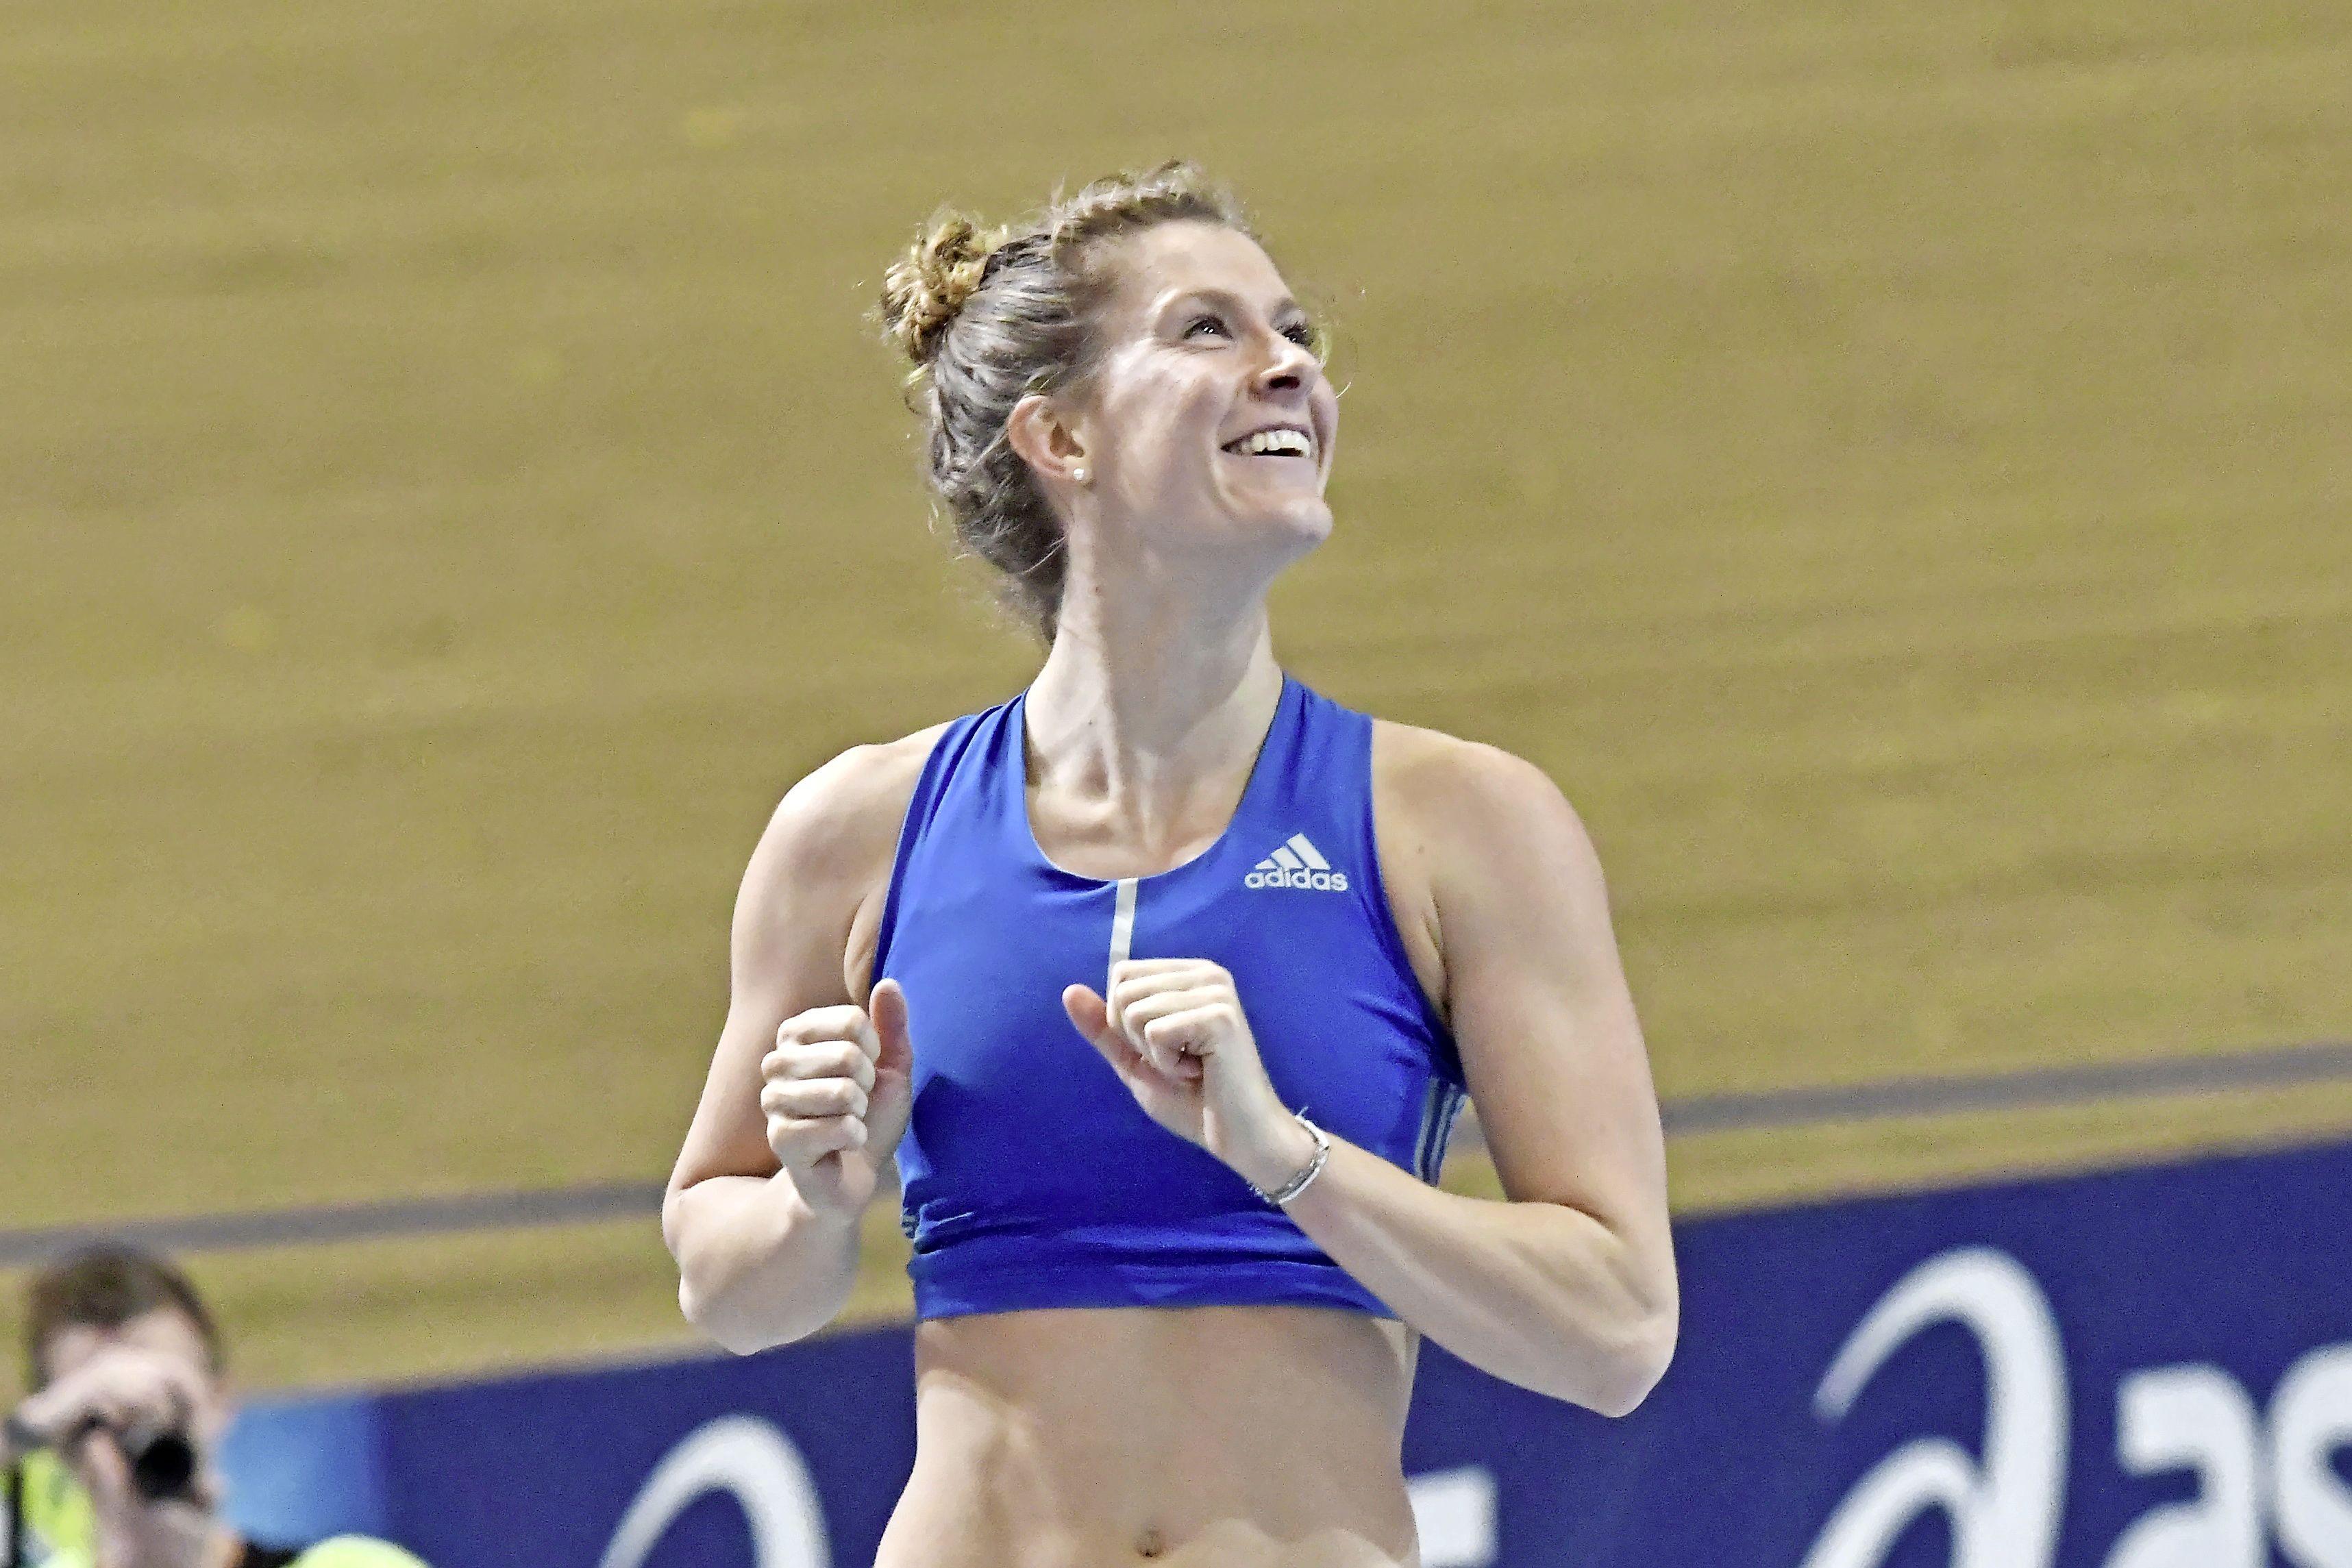 'Polsstokhoogspringen is geen ingewikkelde sport', zegt recordhoudster Femke Pluim. 'Je moet gewoon over die lat, klaar'